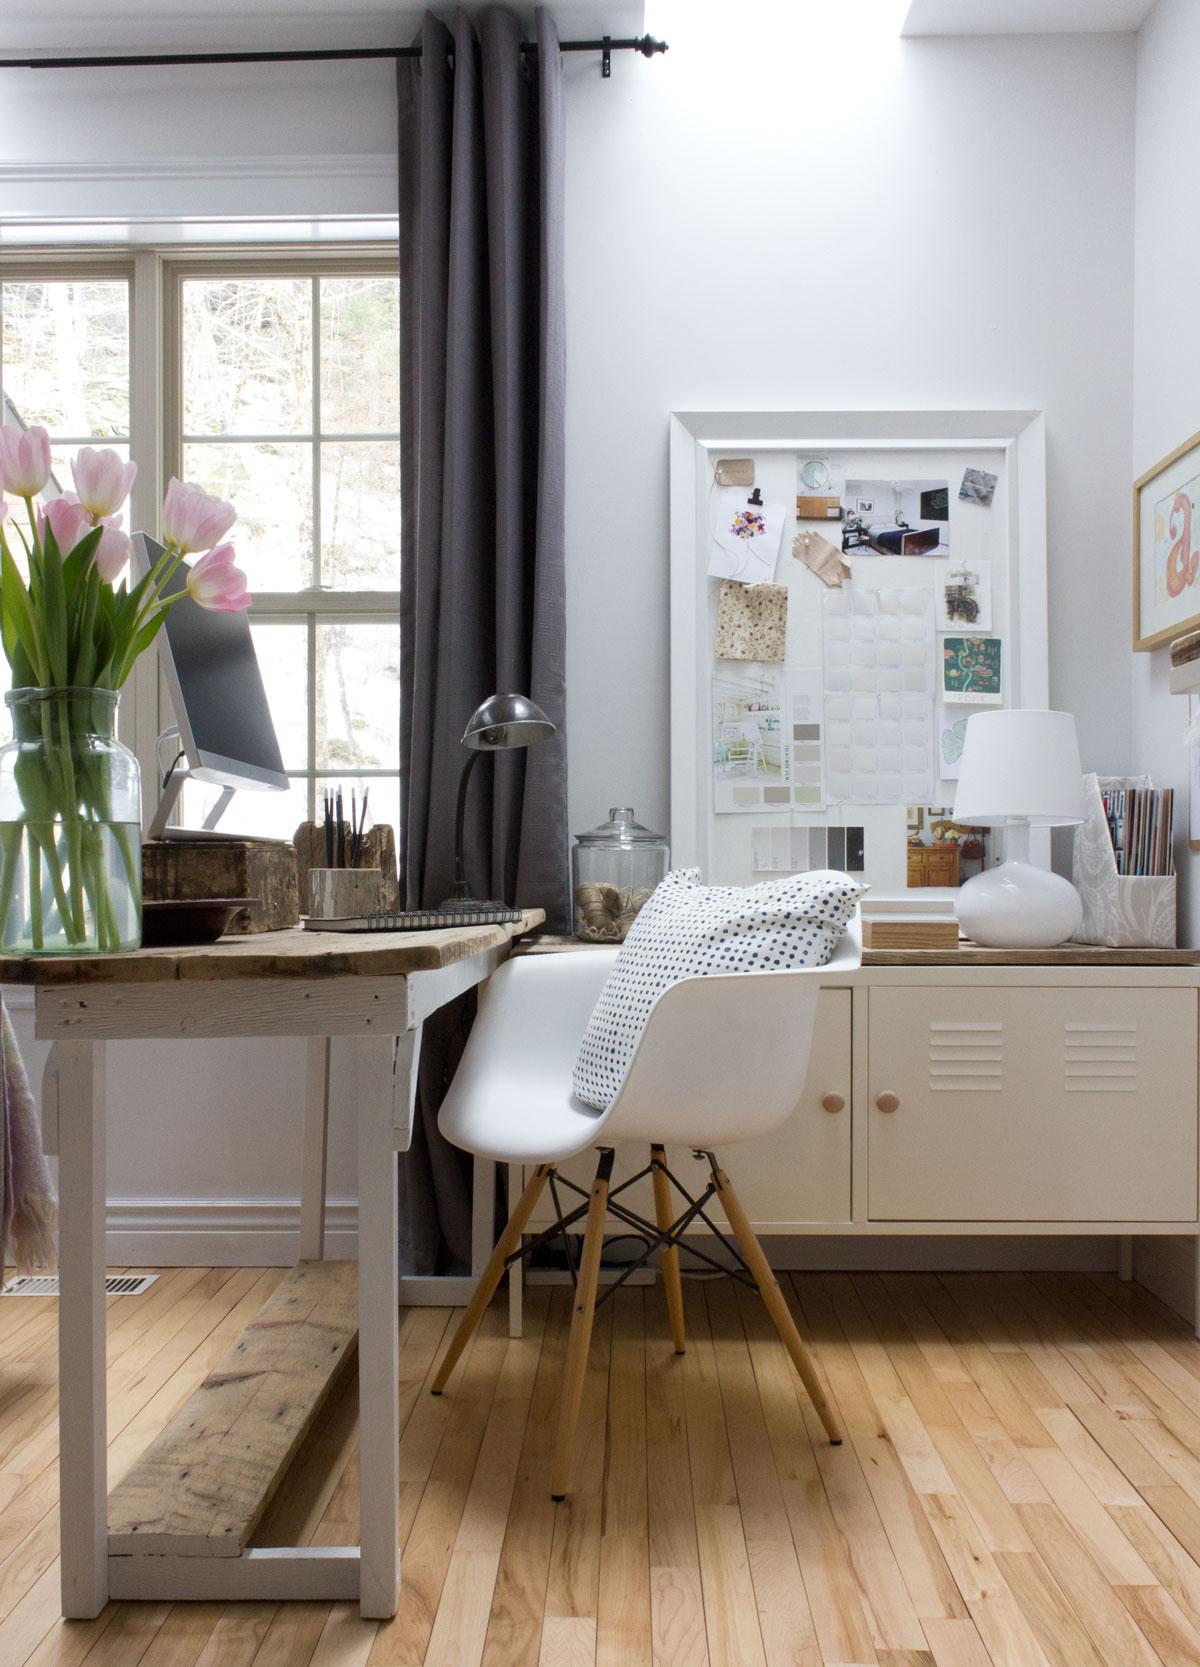 DIY-BARN-BOARD-DESH-AND IKEA-LOCKER-WITH-BARNBOARD-TOP.JPG